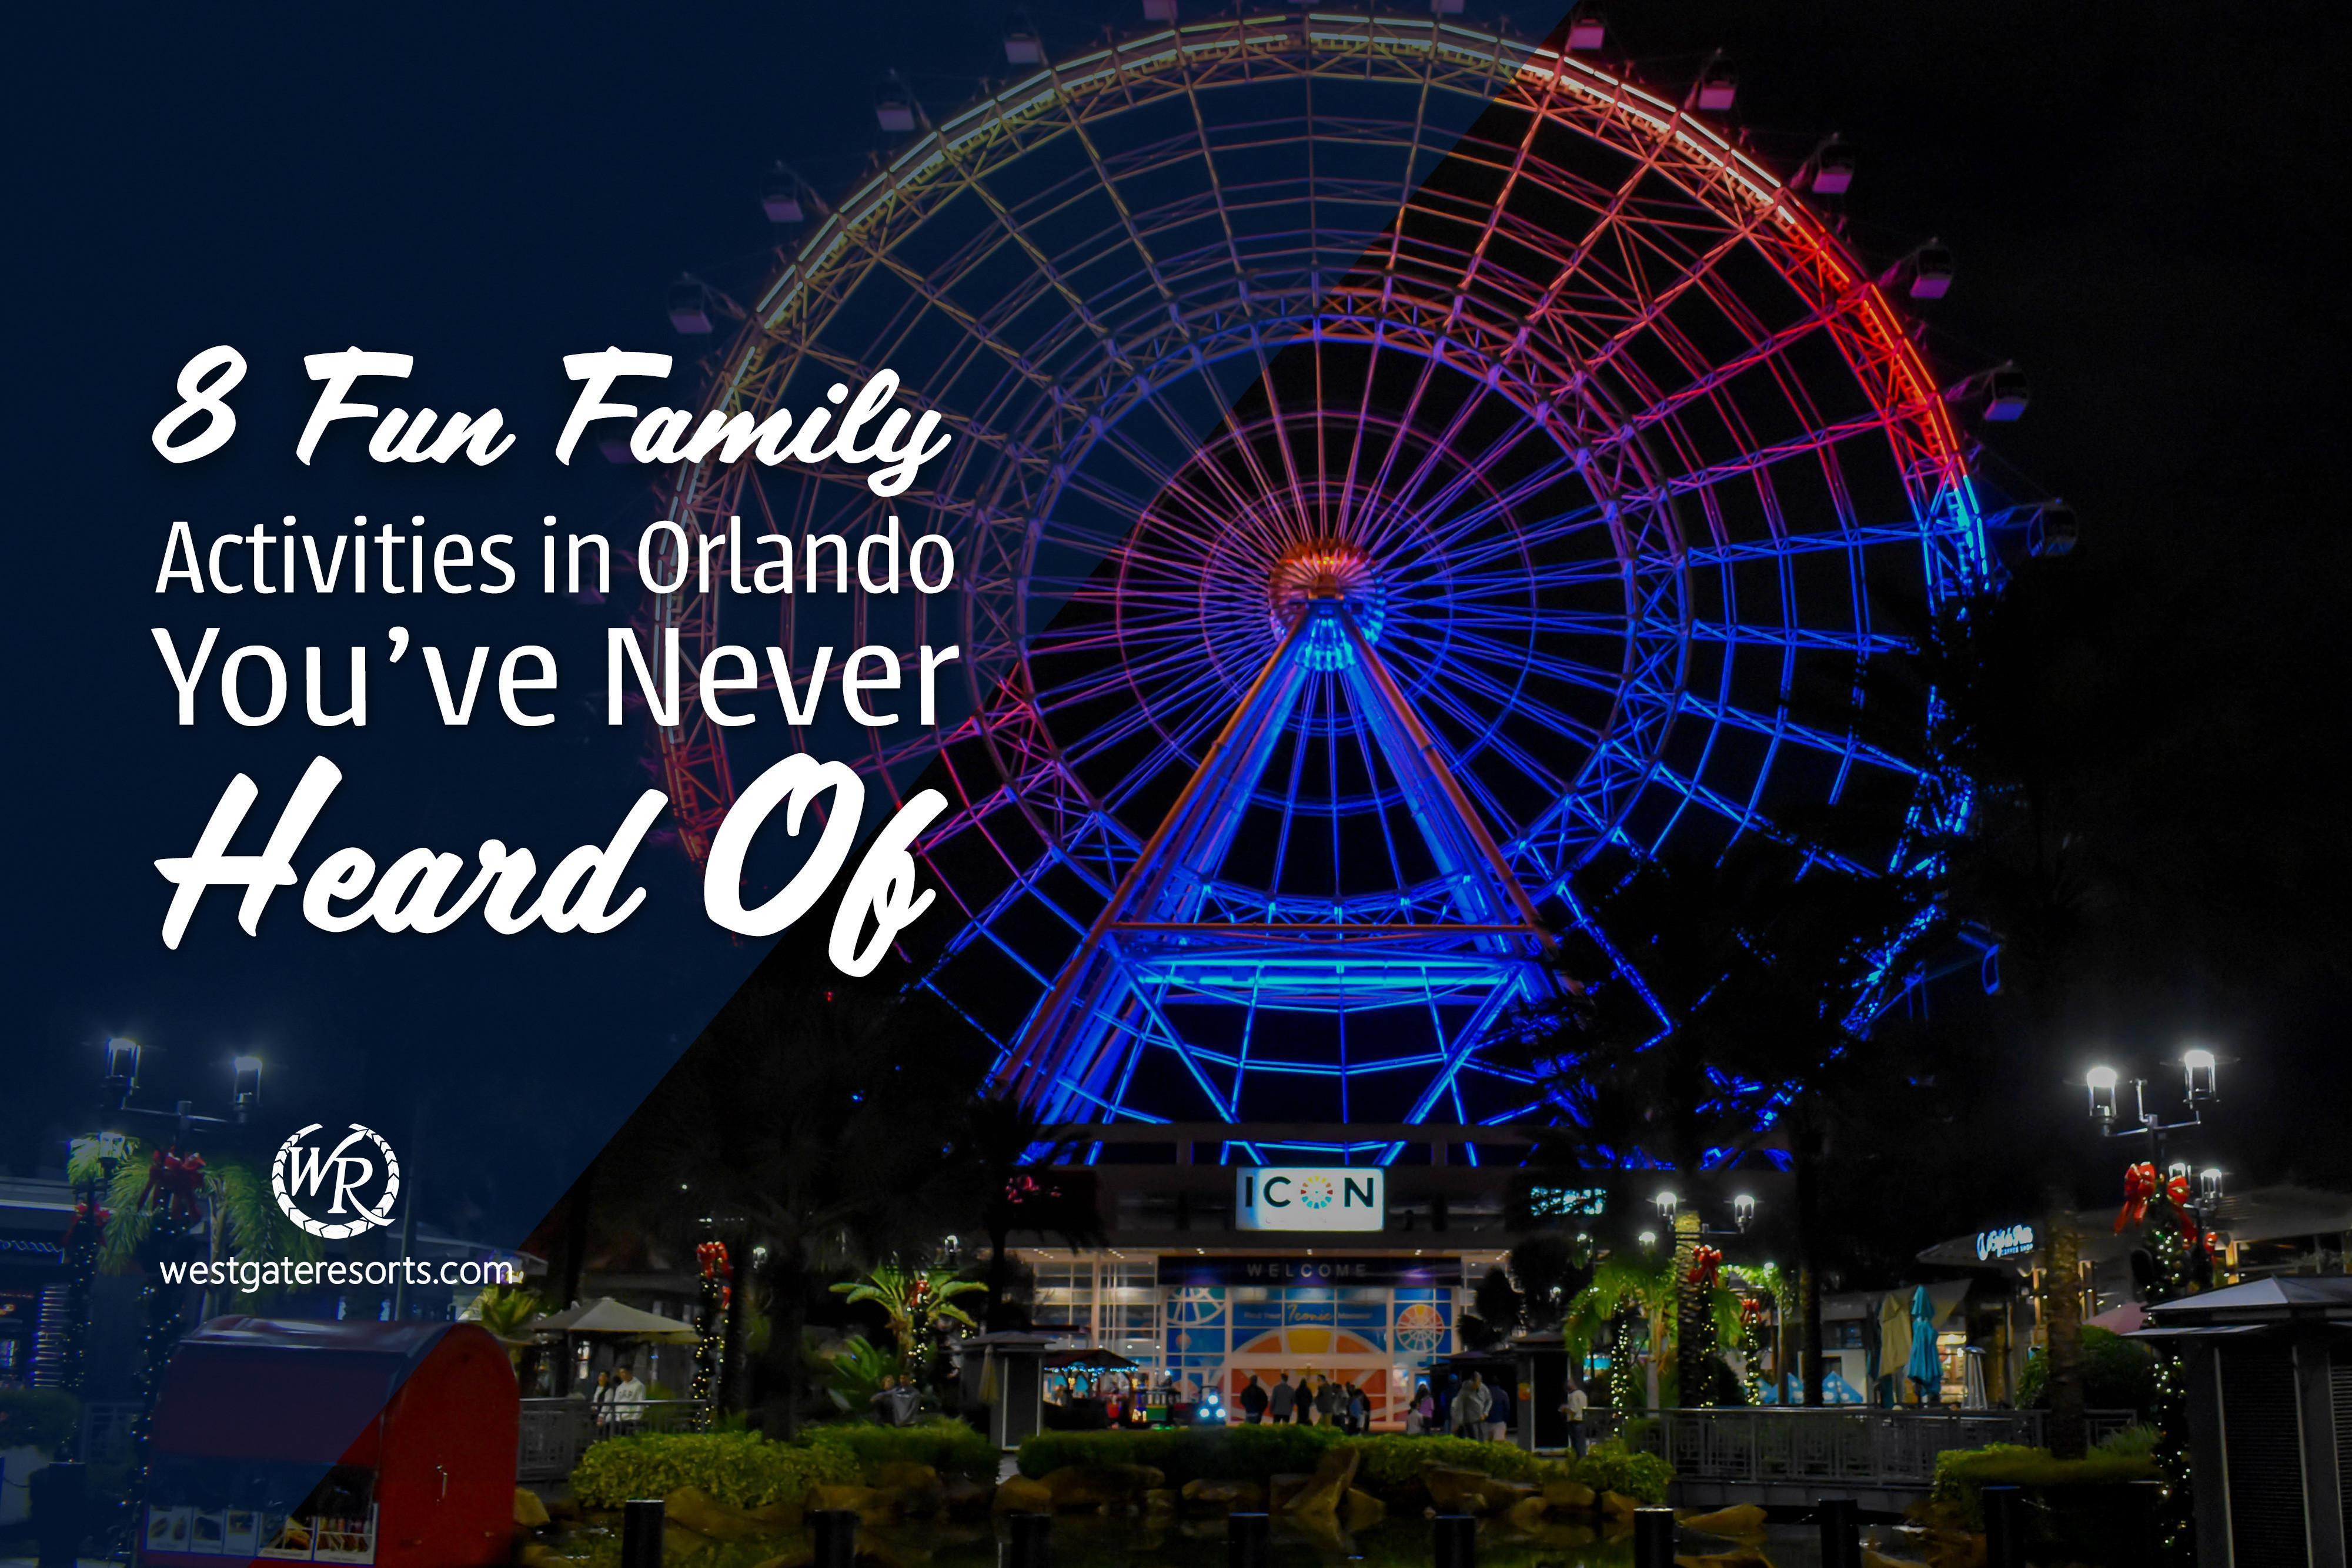 8 Fun Family Activities in Orlando You've Never Heard Off